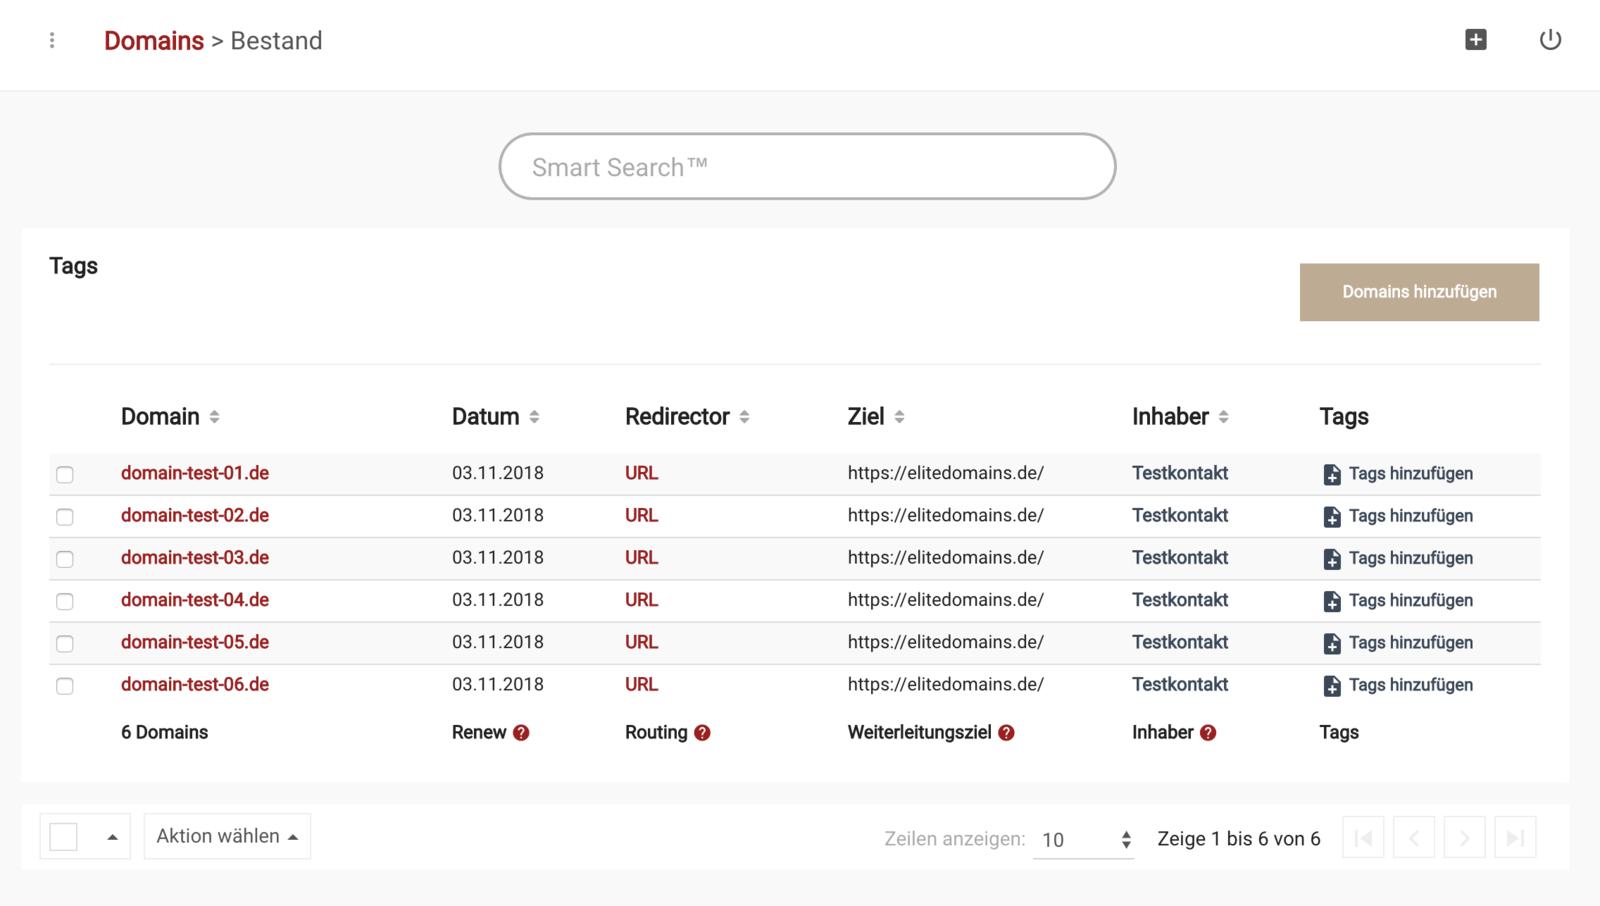 .de Domains bestellen - Schritt 7 - Domains verwalten